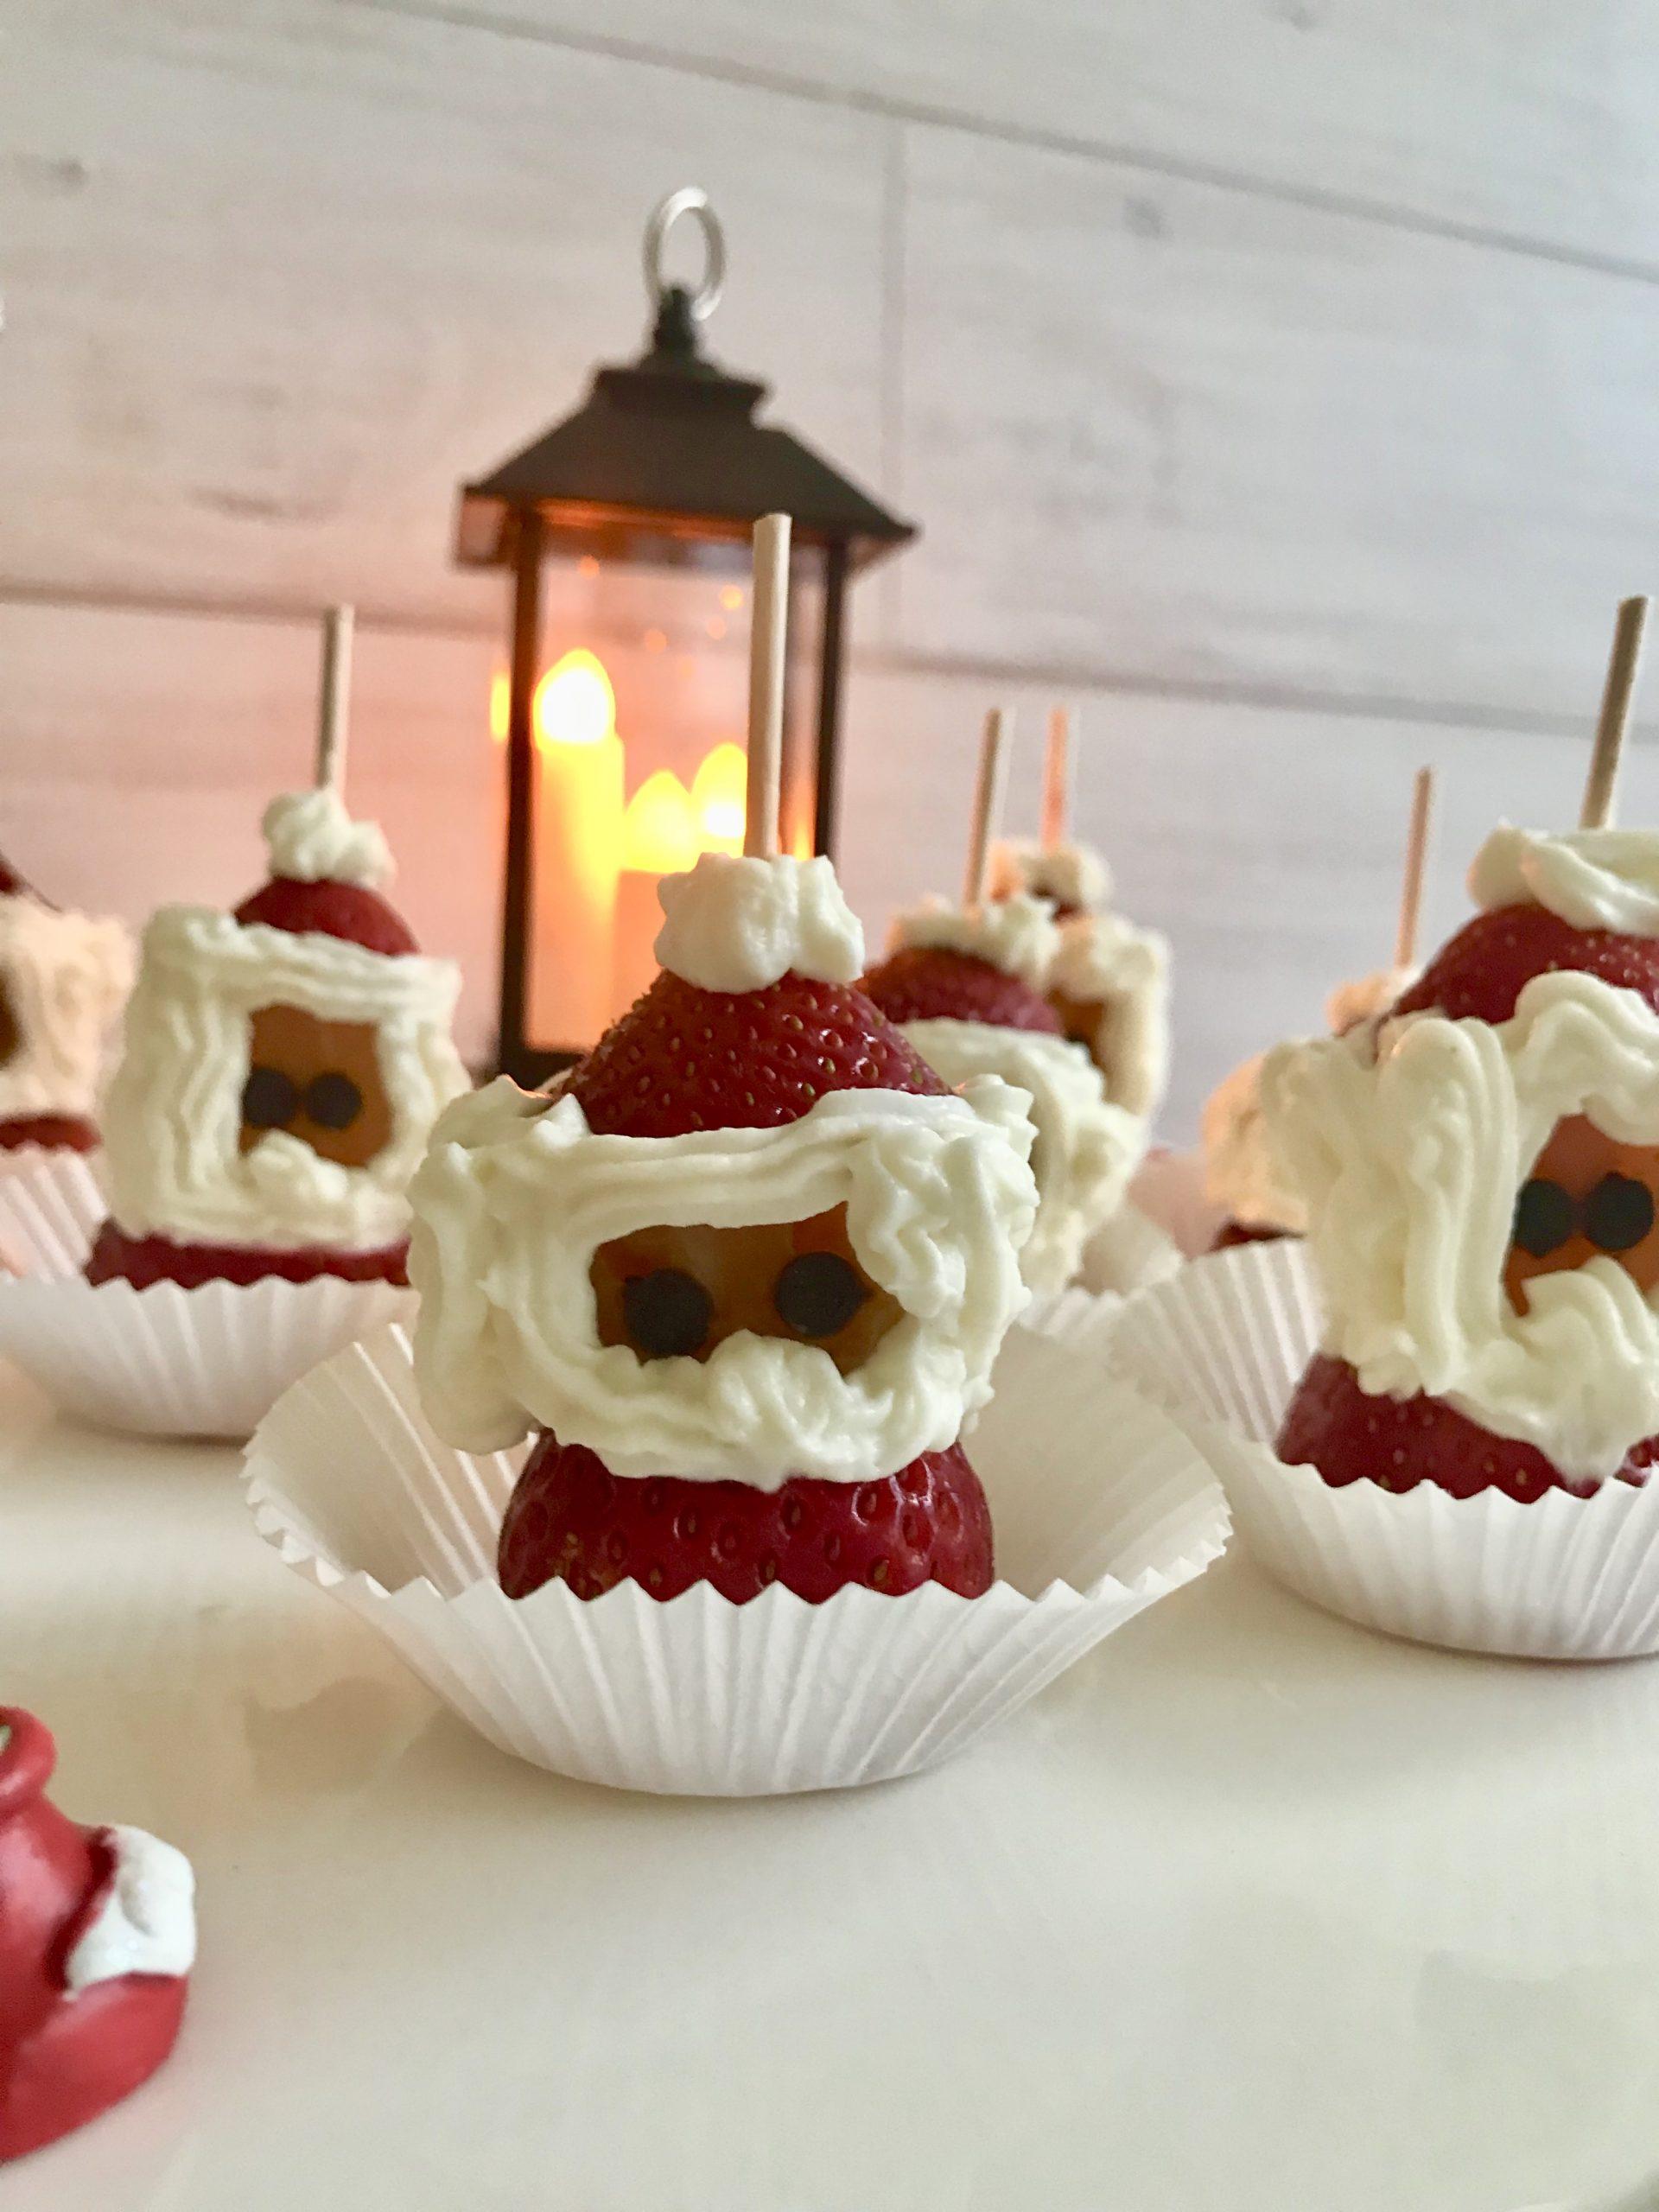 Piping for Strawberry Cream Cheese Santas